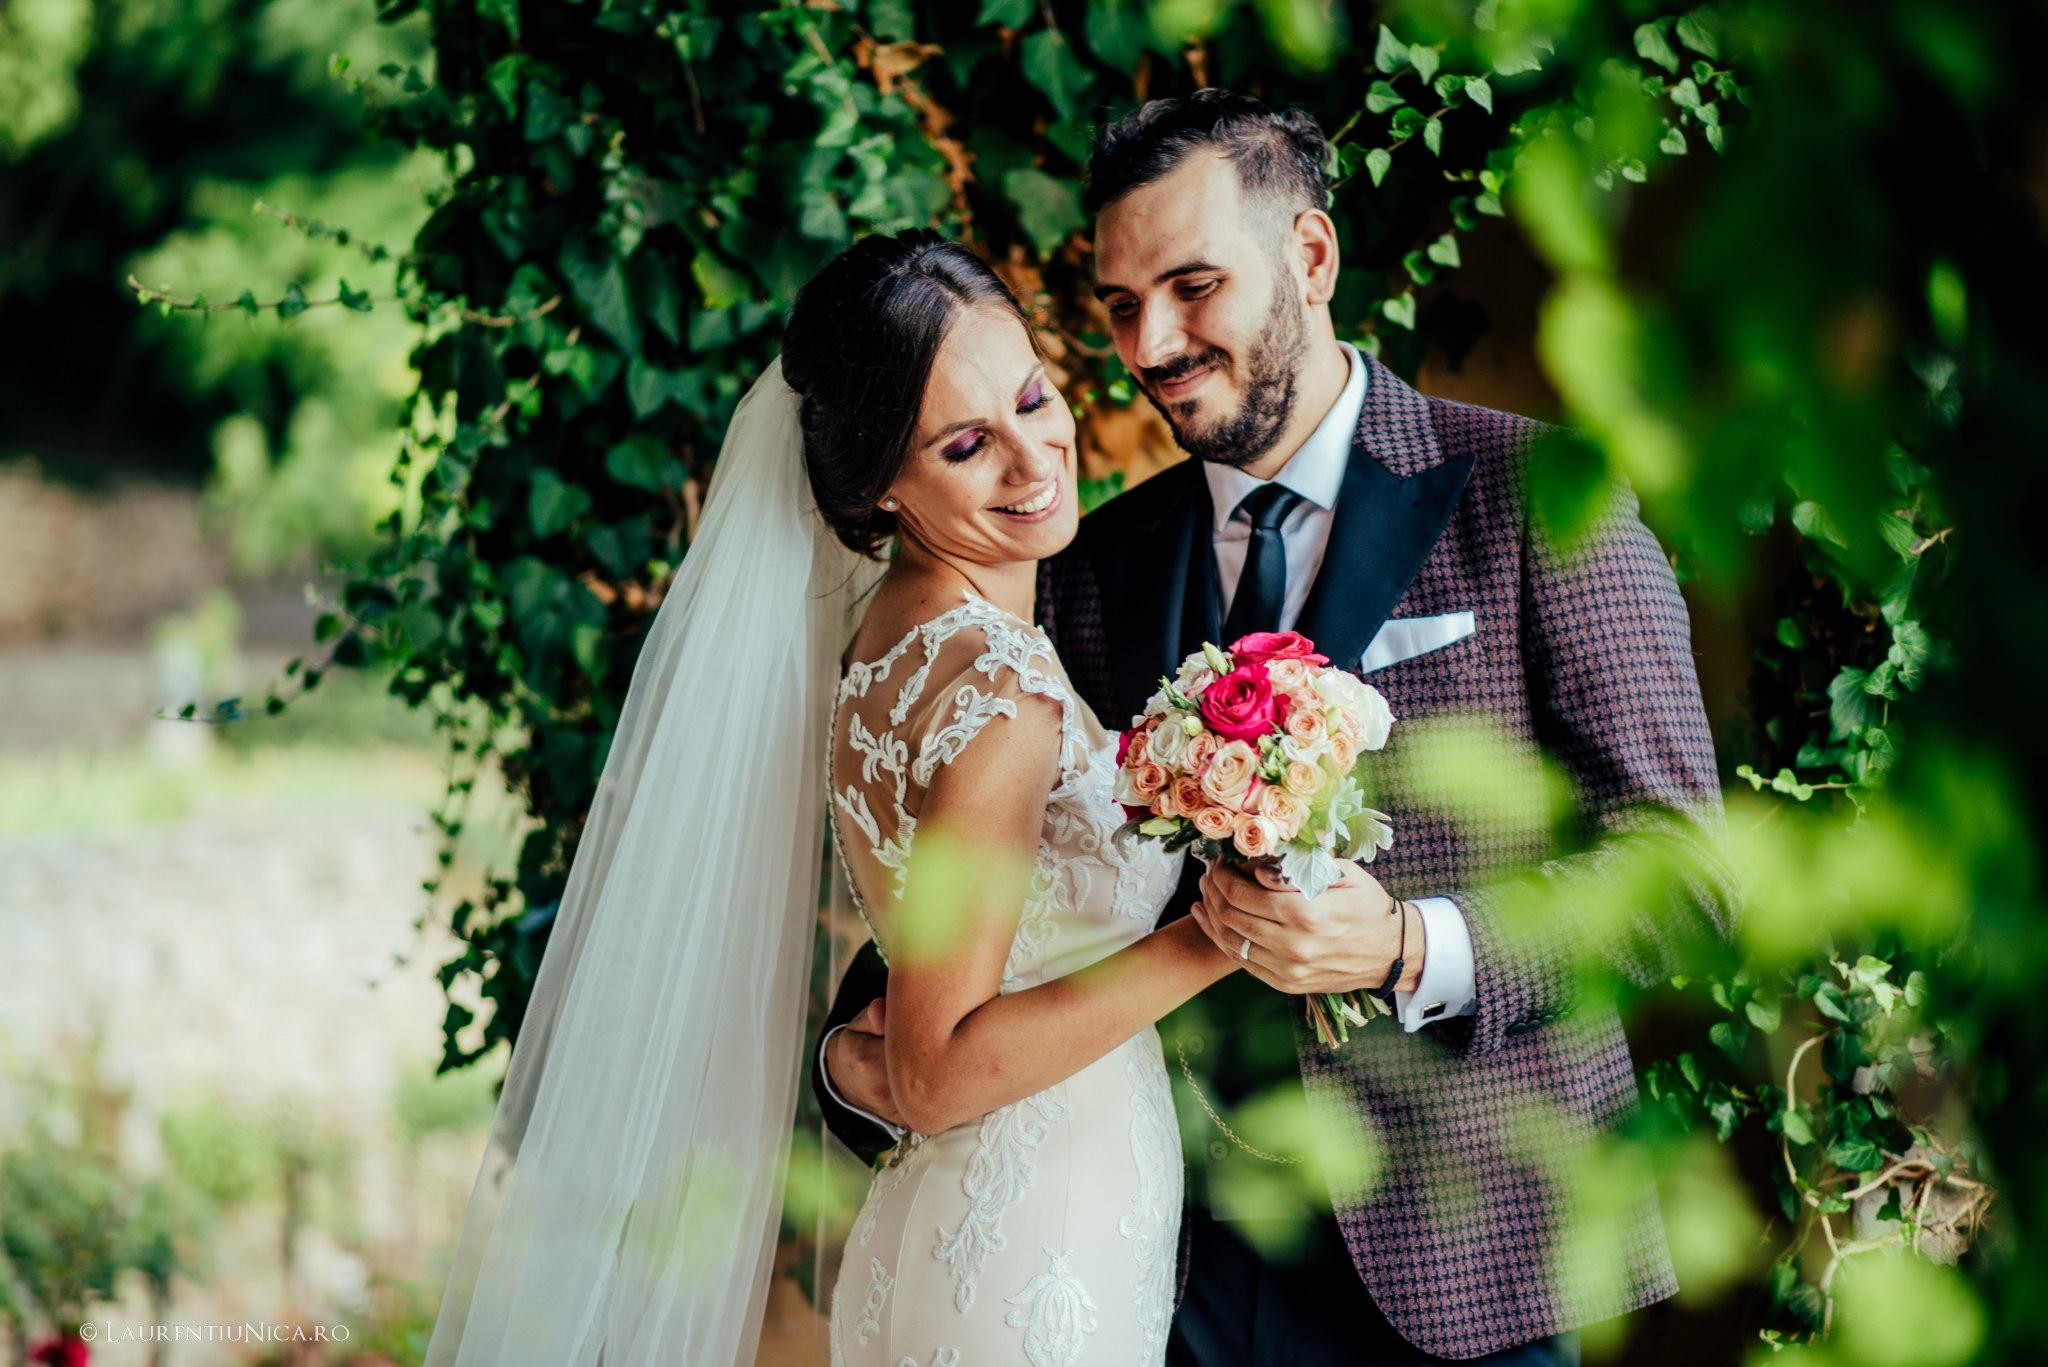 andreea si alin fotografii after wedding balchik bulgaria25 - Andreea & Alin | Fotografii After Wedding | Balchik Bulgaria